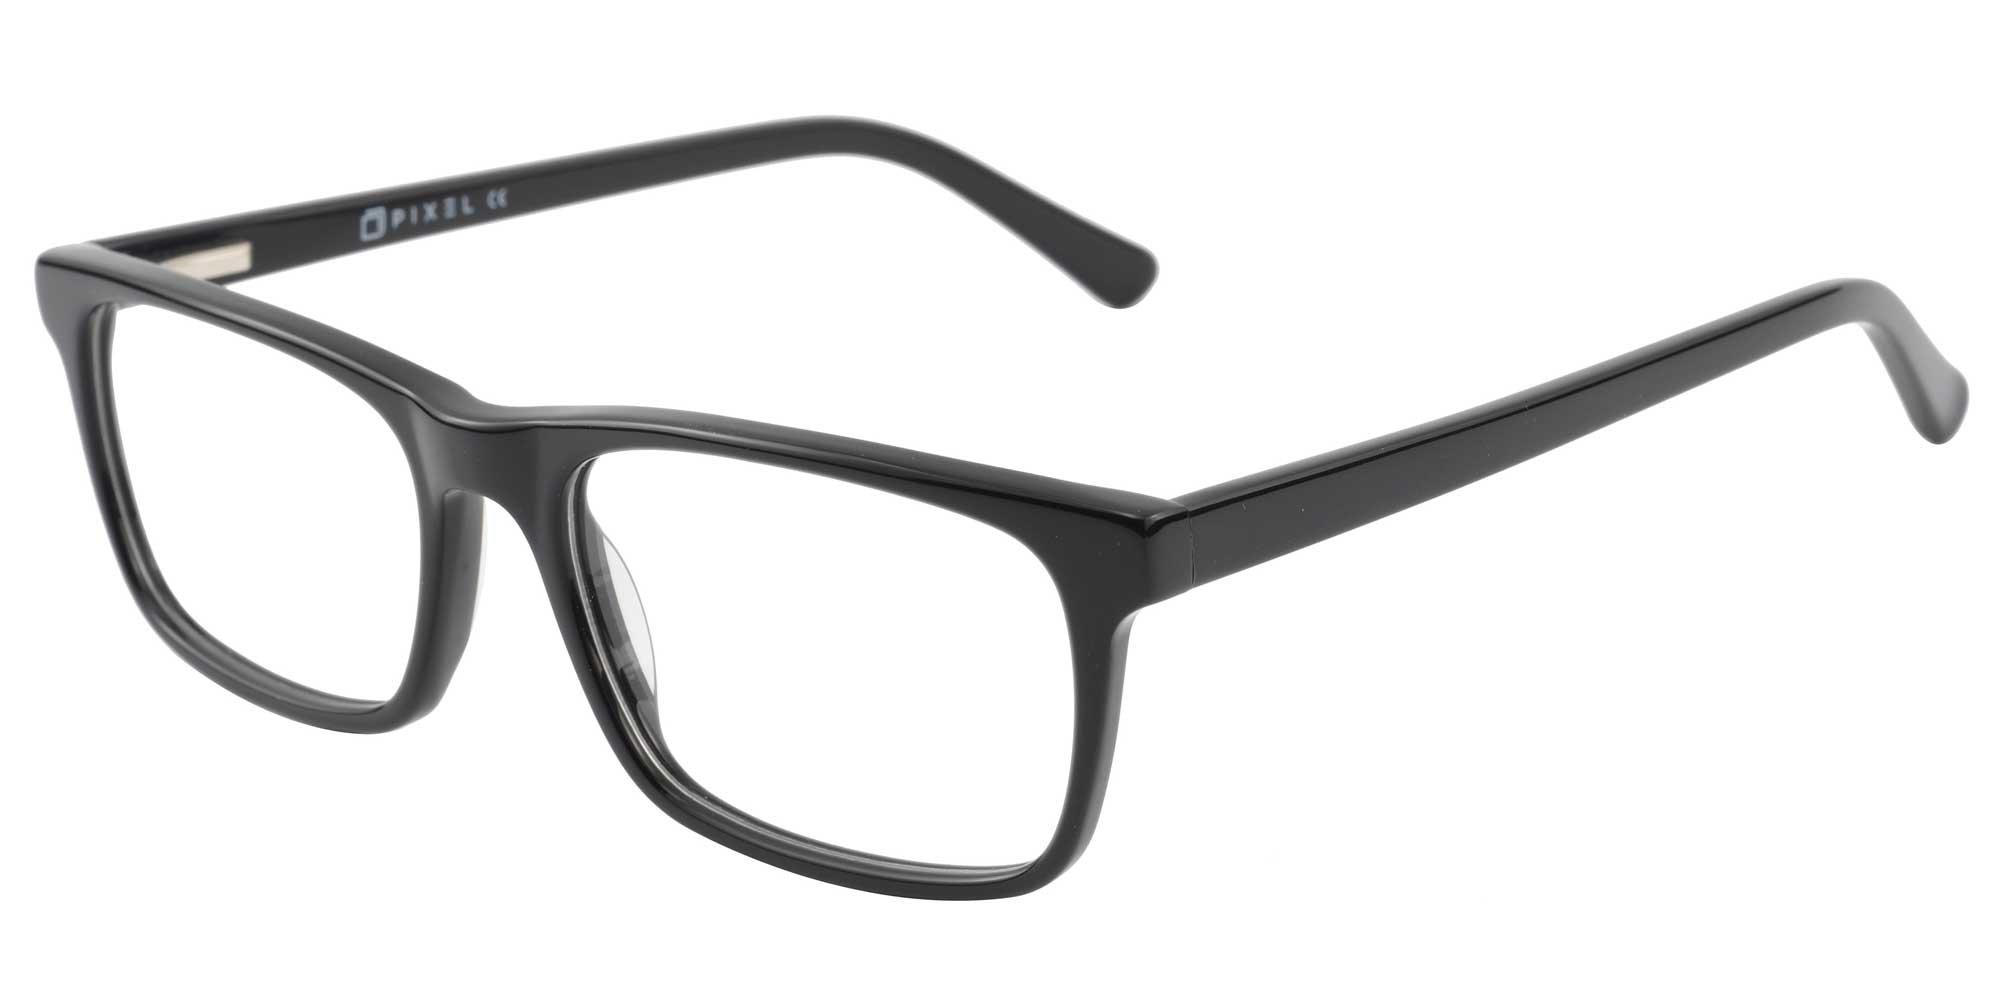 Pixel Eyewear Designer Computer Glasses with Anti-Blue Light Tint UV Protection, Anti-Glare, Full Rim, Acetate Frame Black Color - Buteo Style by Pixel Eyewear (Image #3)